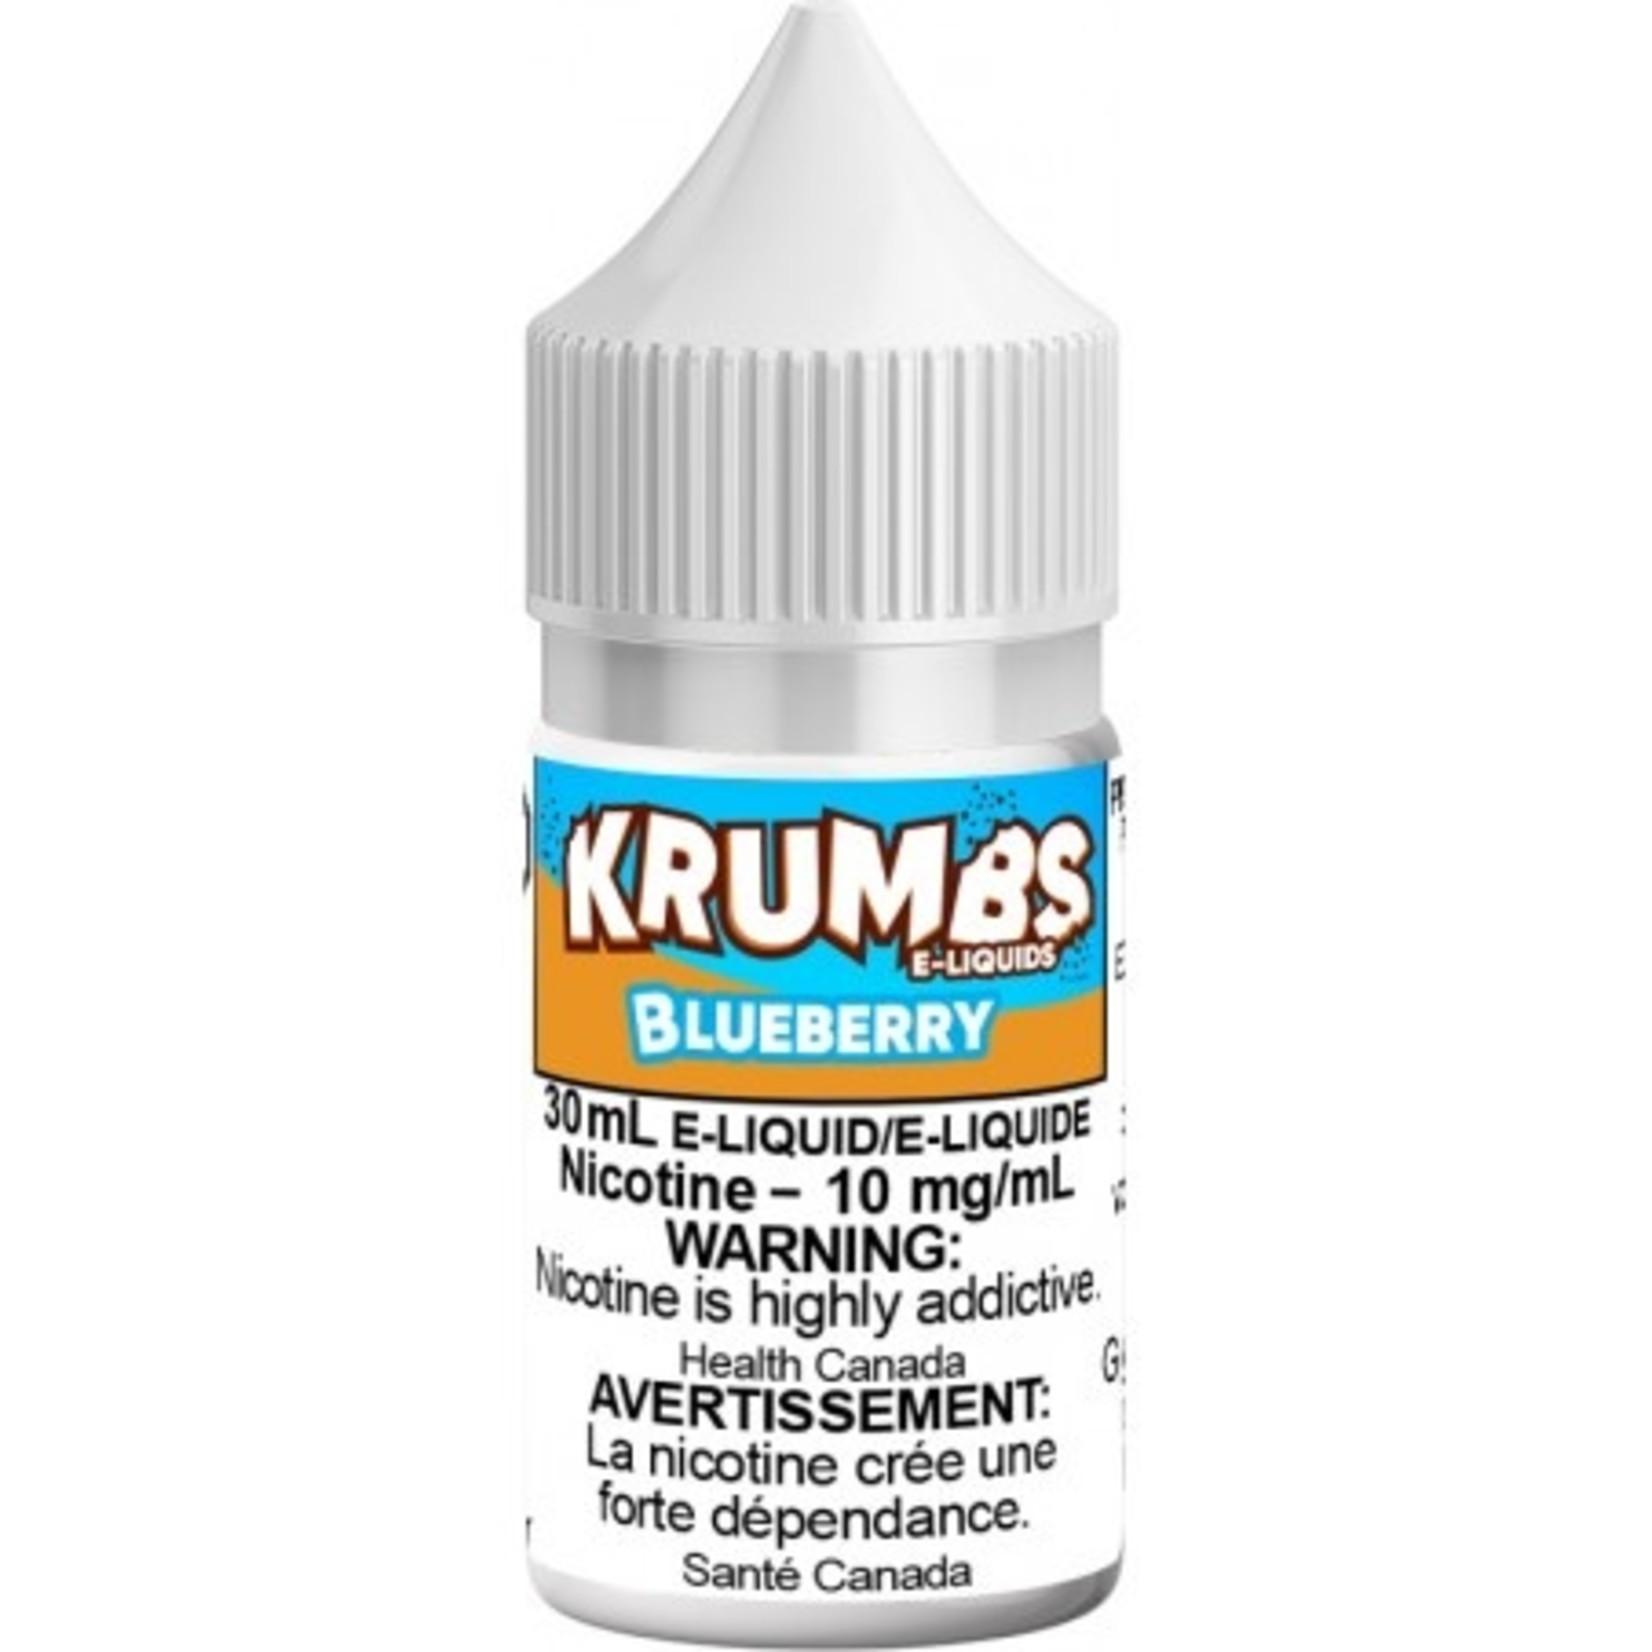 Krumbs Blueberry Salt